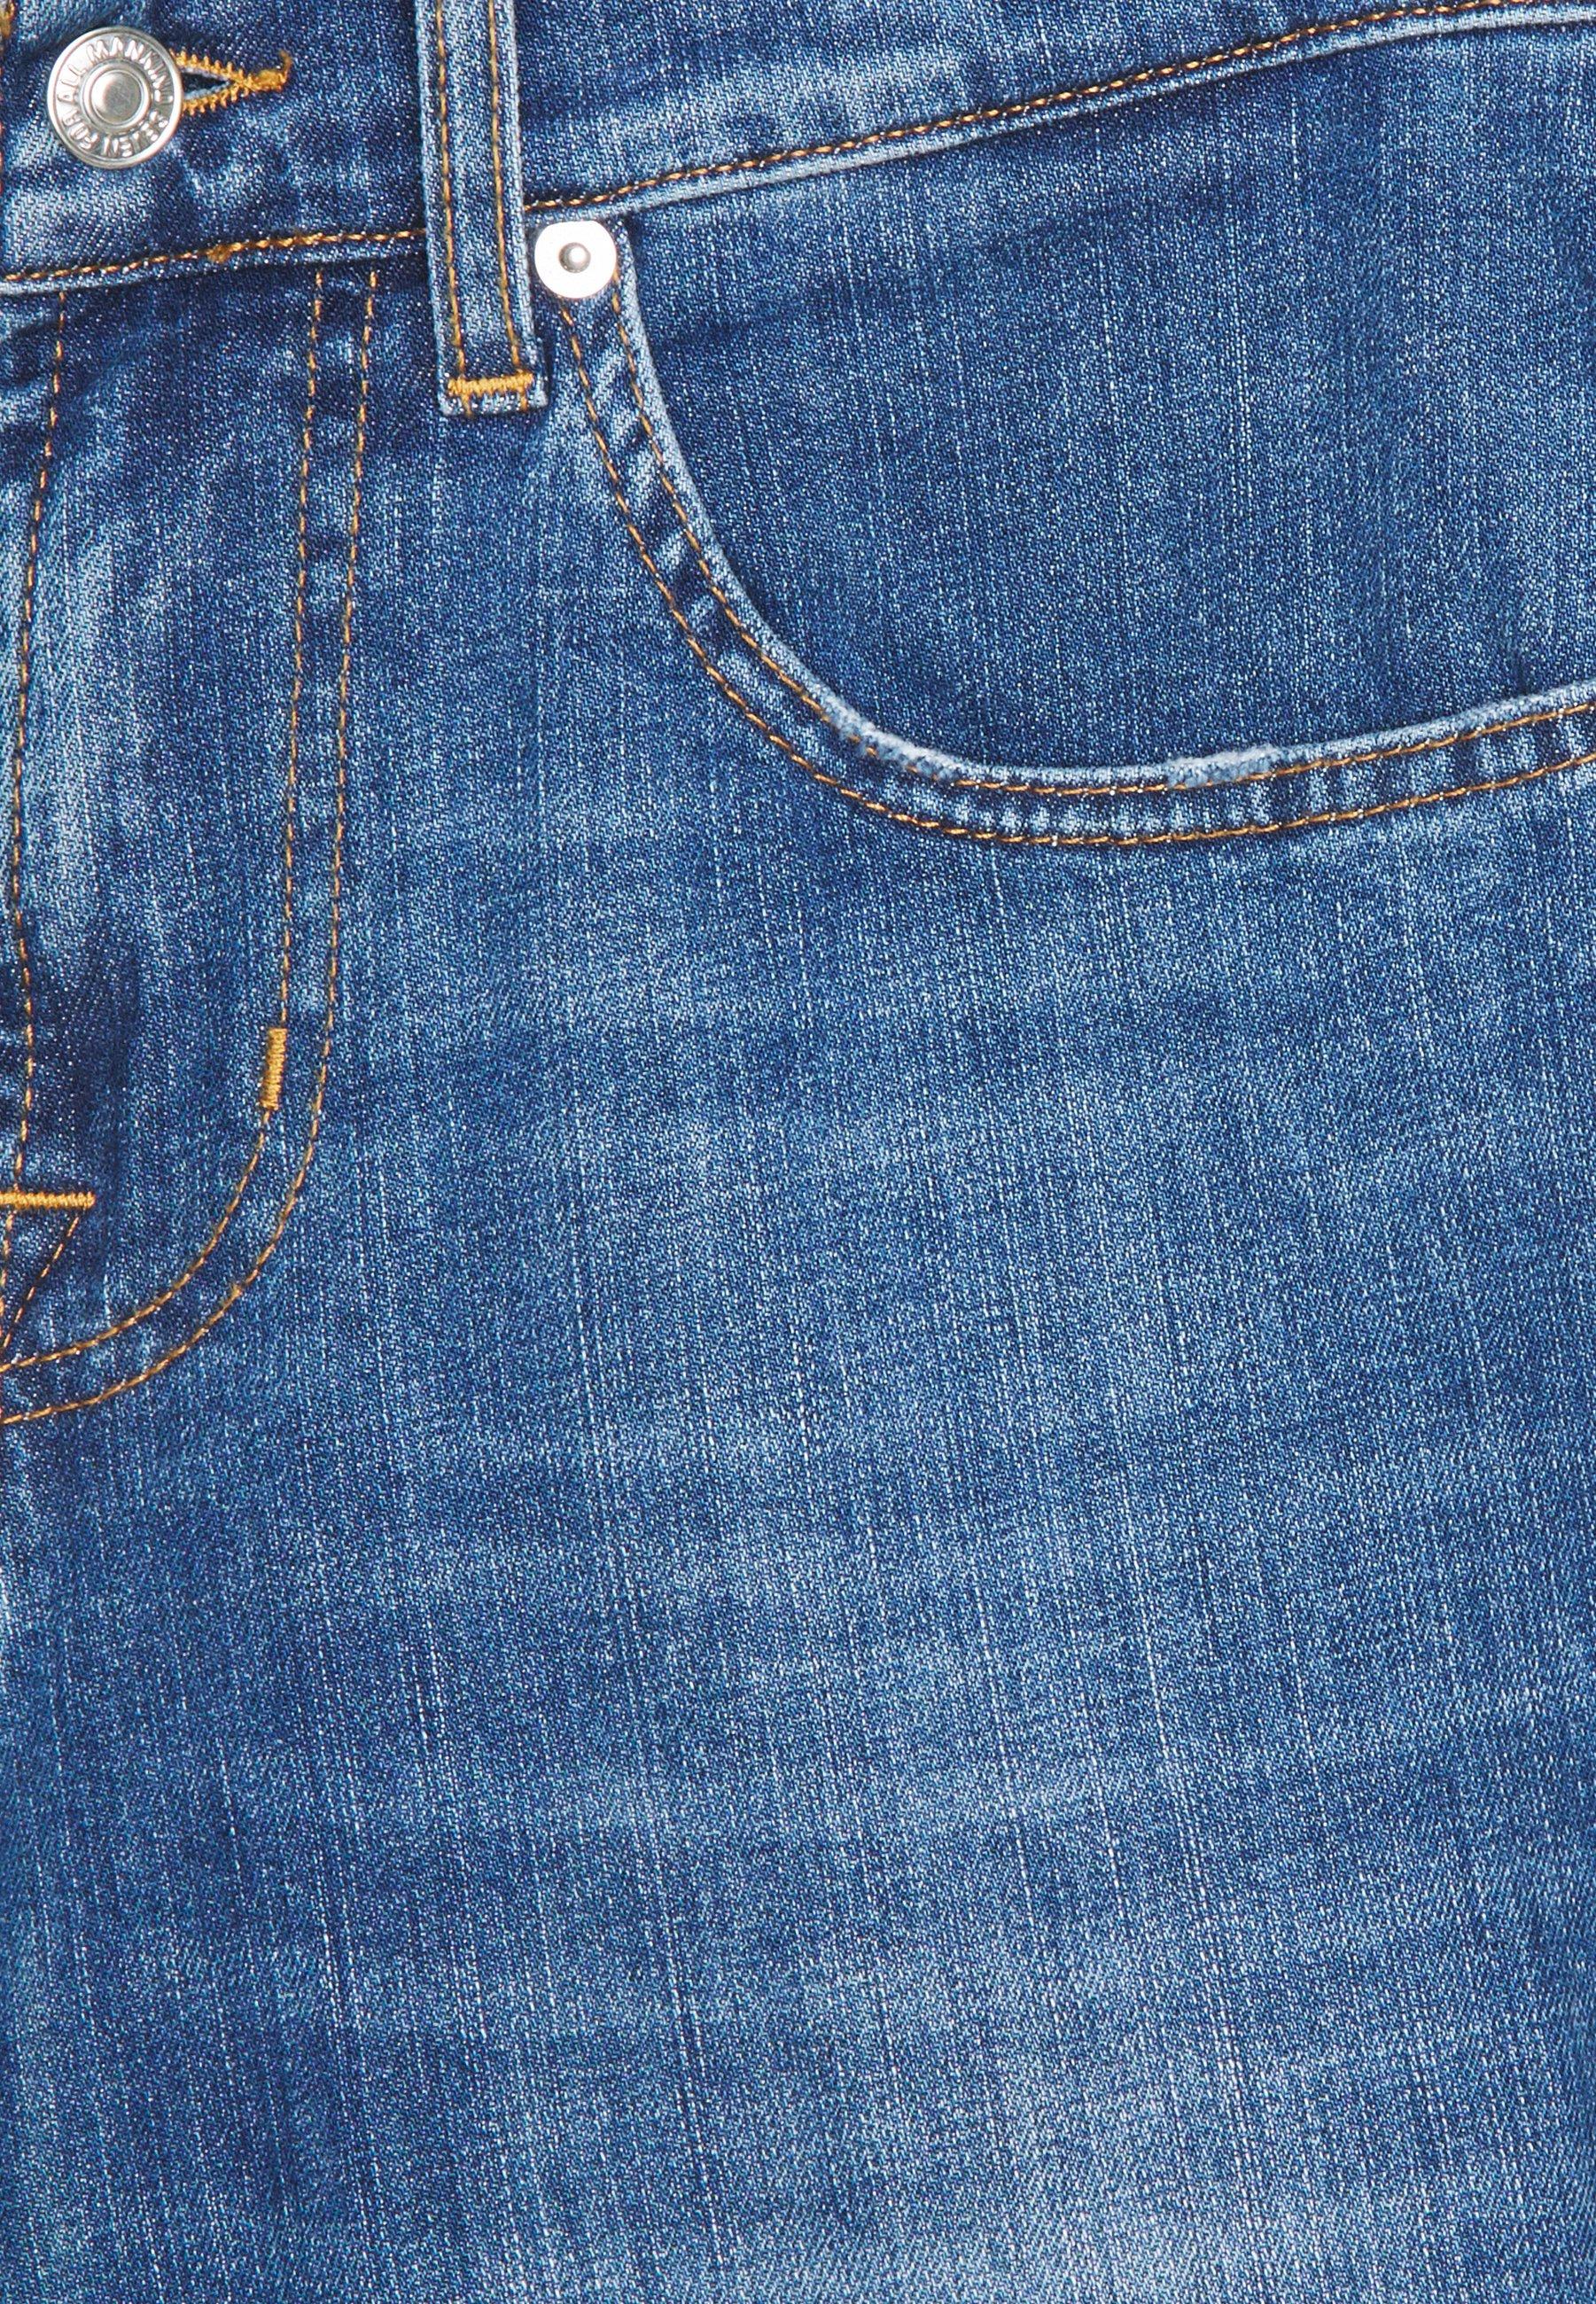 100% D\'Origine Vêtements homme 7 for all mankind SLIMMY TAPERED CRASH  Jeans fuselé light blue QE5iVFNx